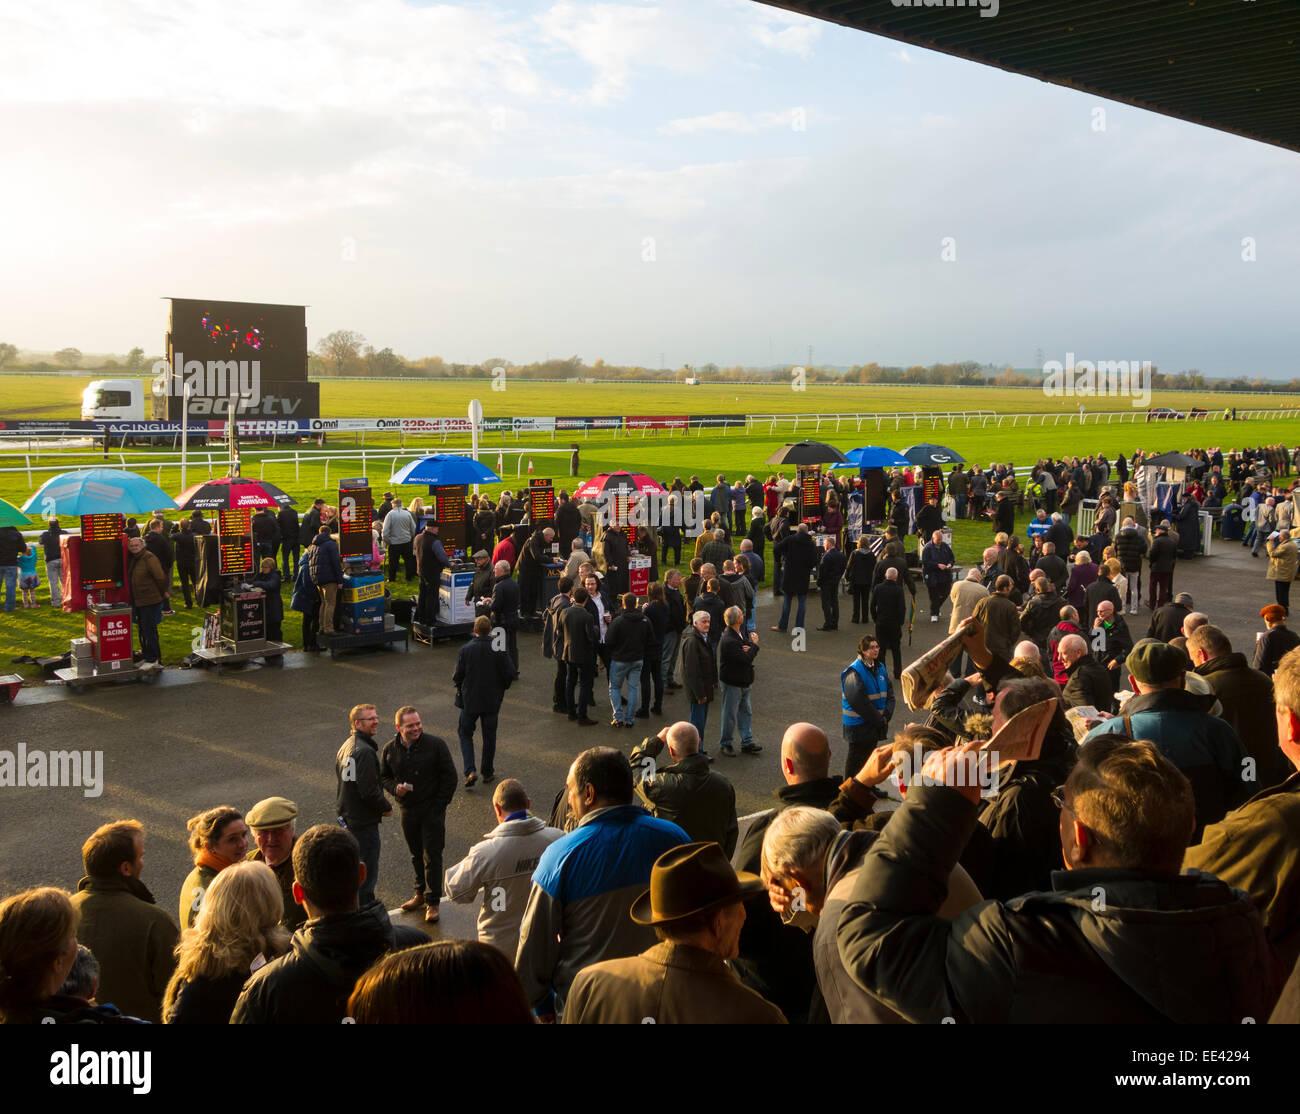 Huntington race track. - Stock Image